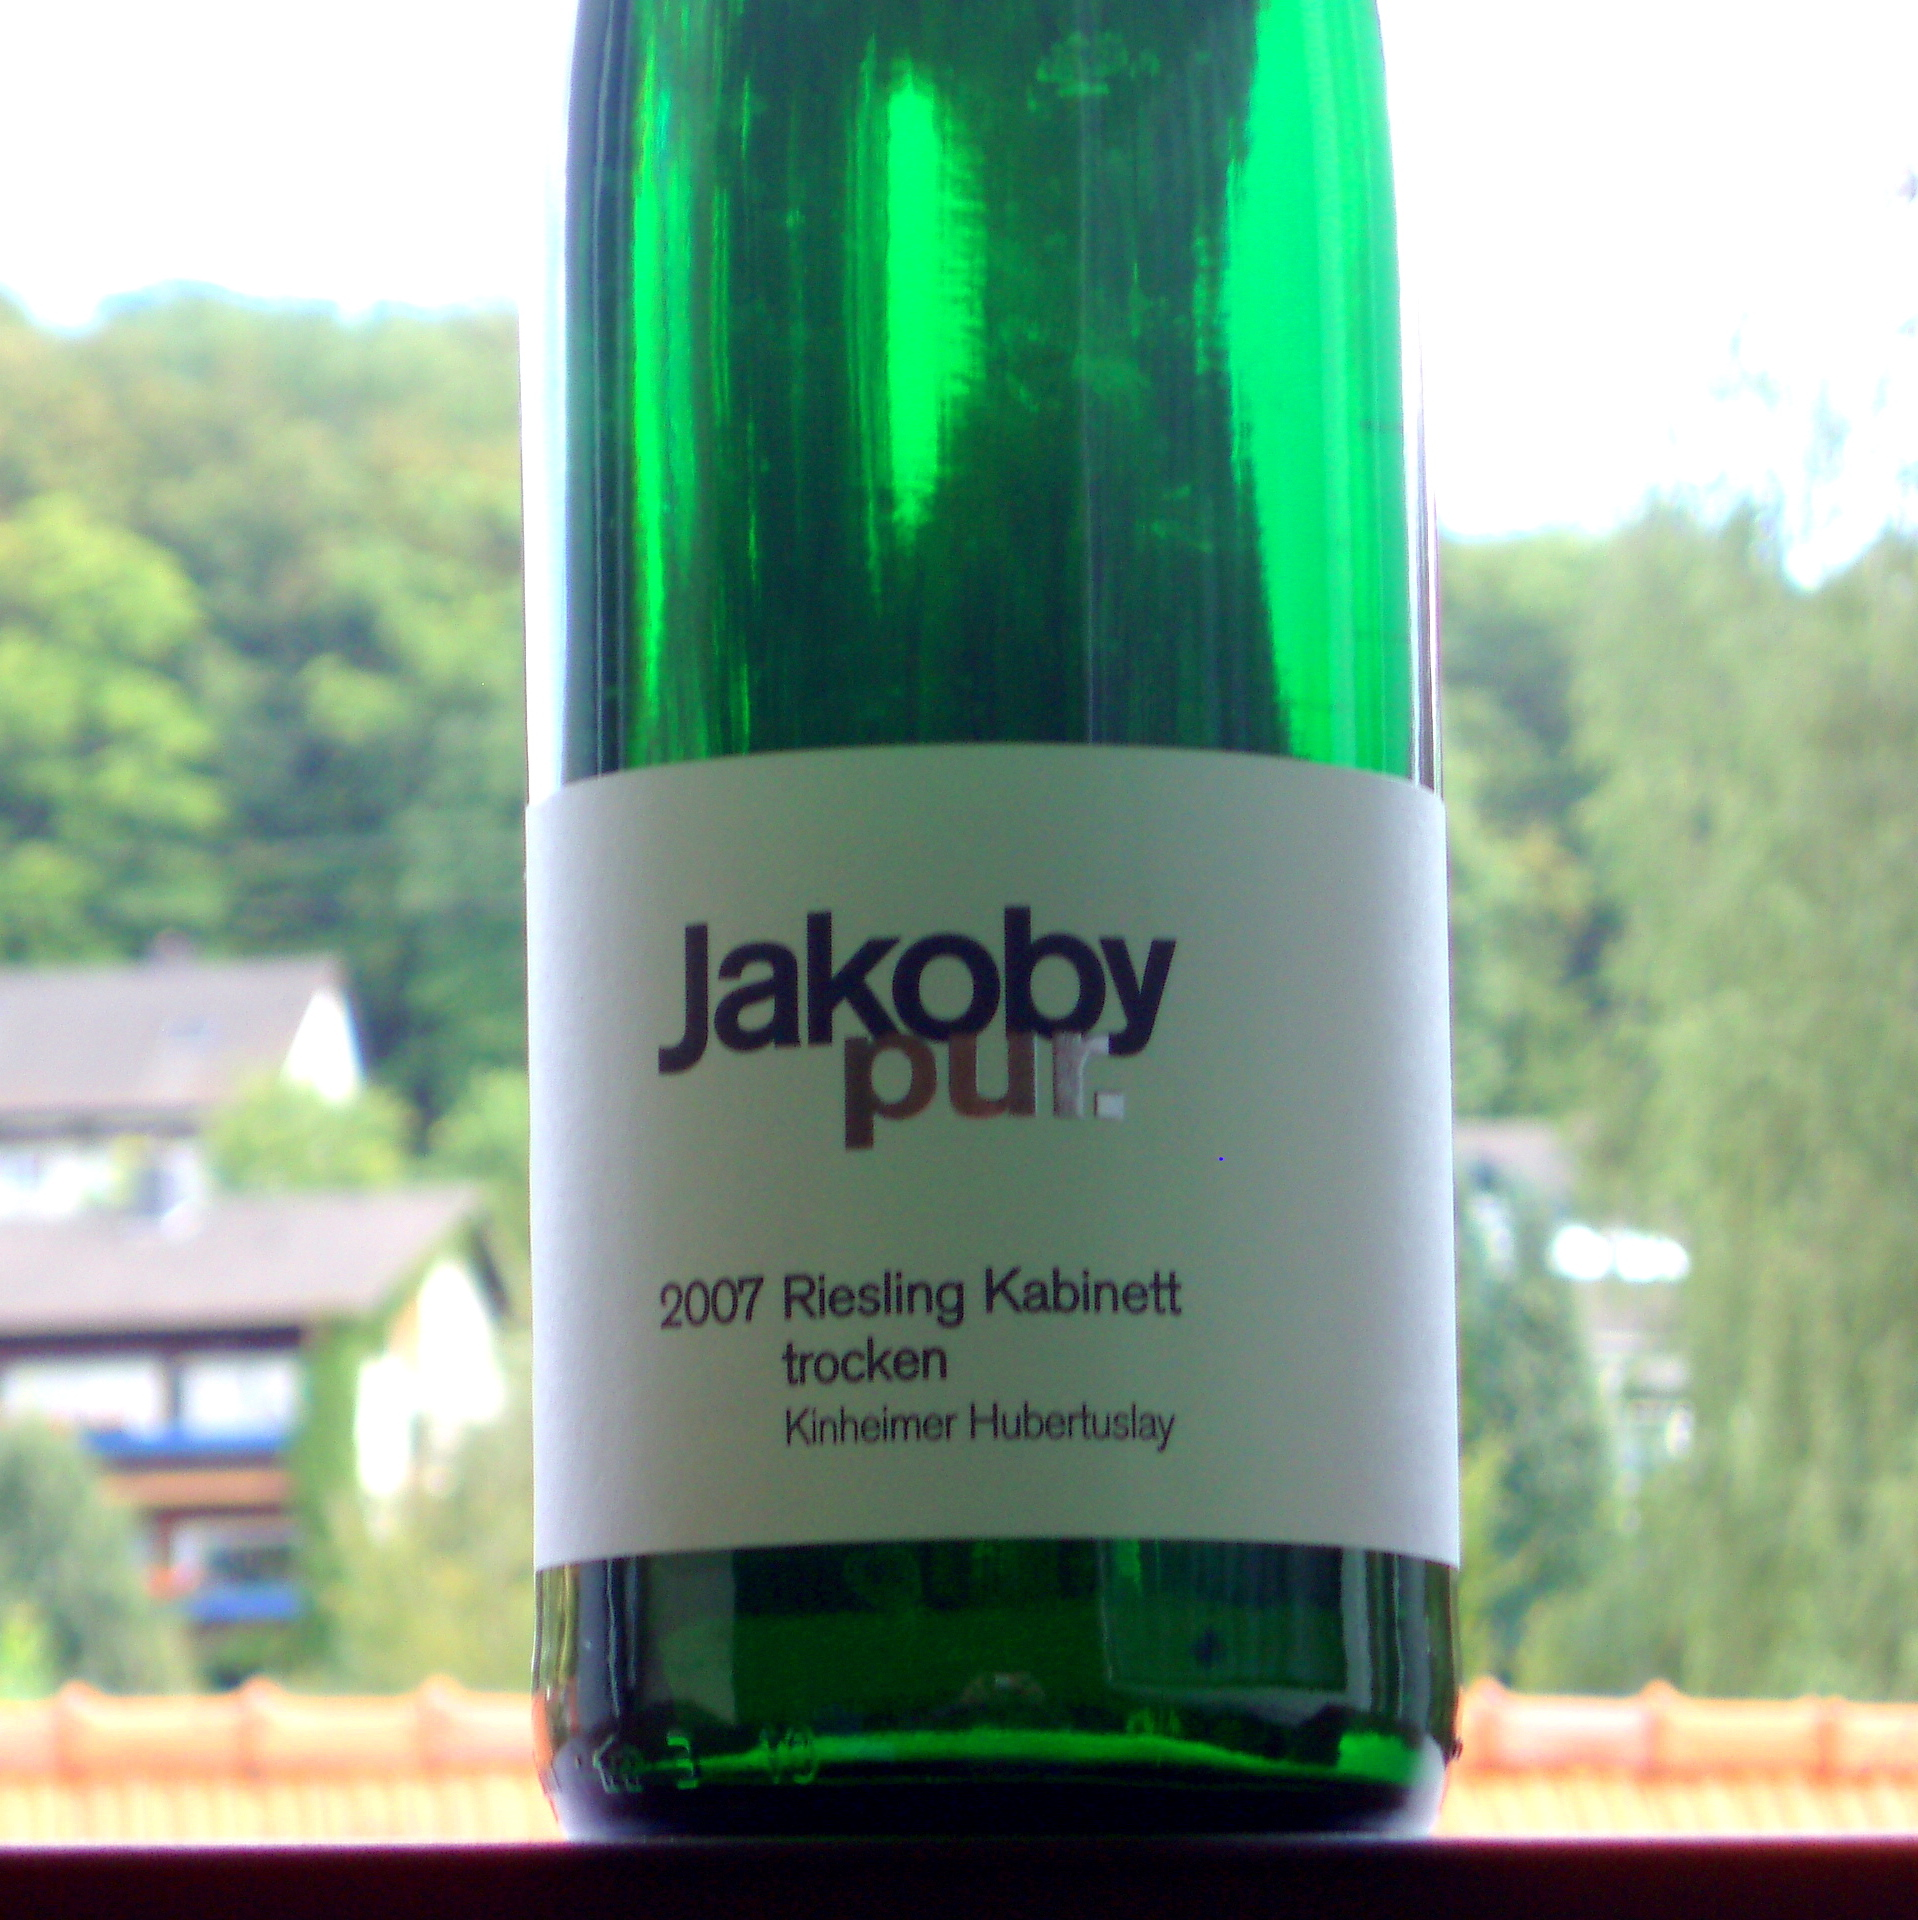 2007 Riesling Kabinett trocken Kinheimer Hubertuslay Jakoby pur